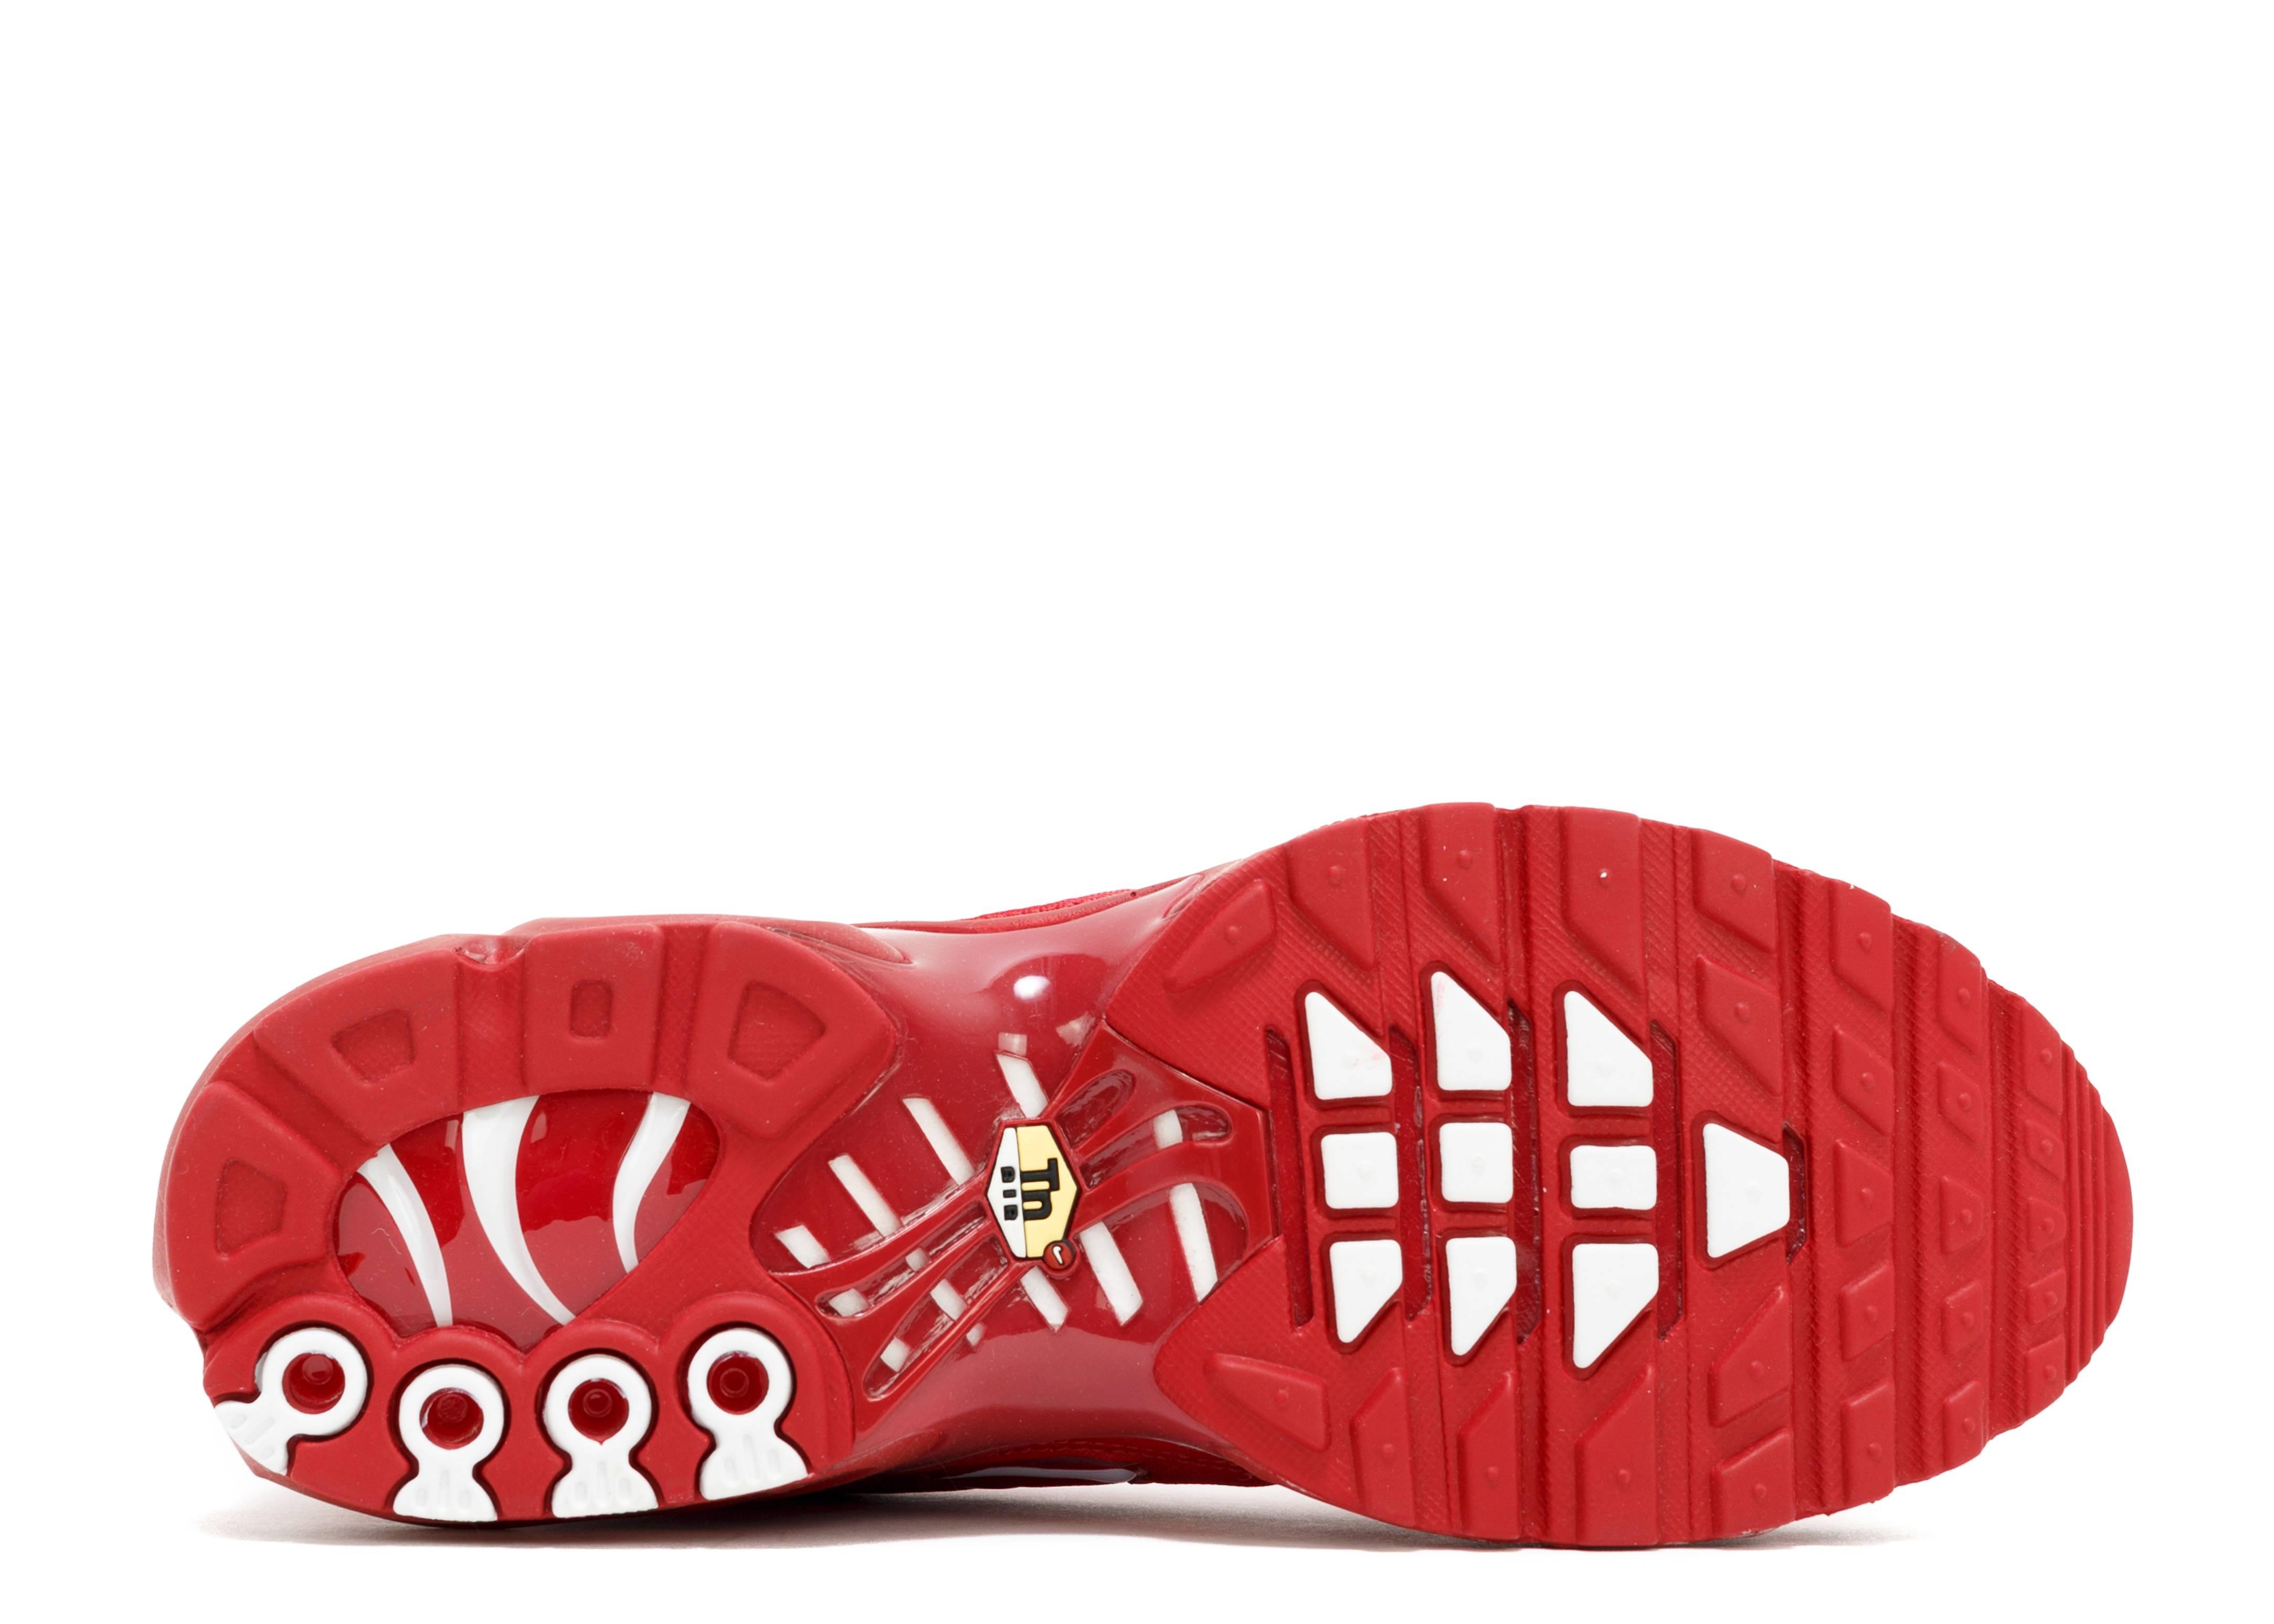 size 40 14355 6c190 ... Air Max Plus Txt - Nike - 647315 616 - pepper red white Fli ...